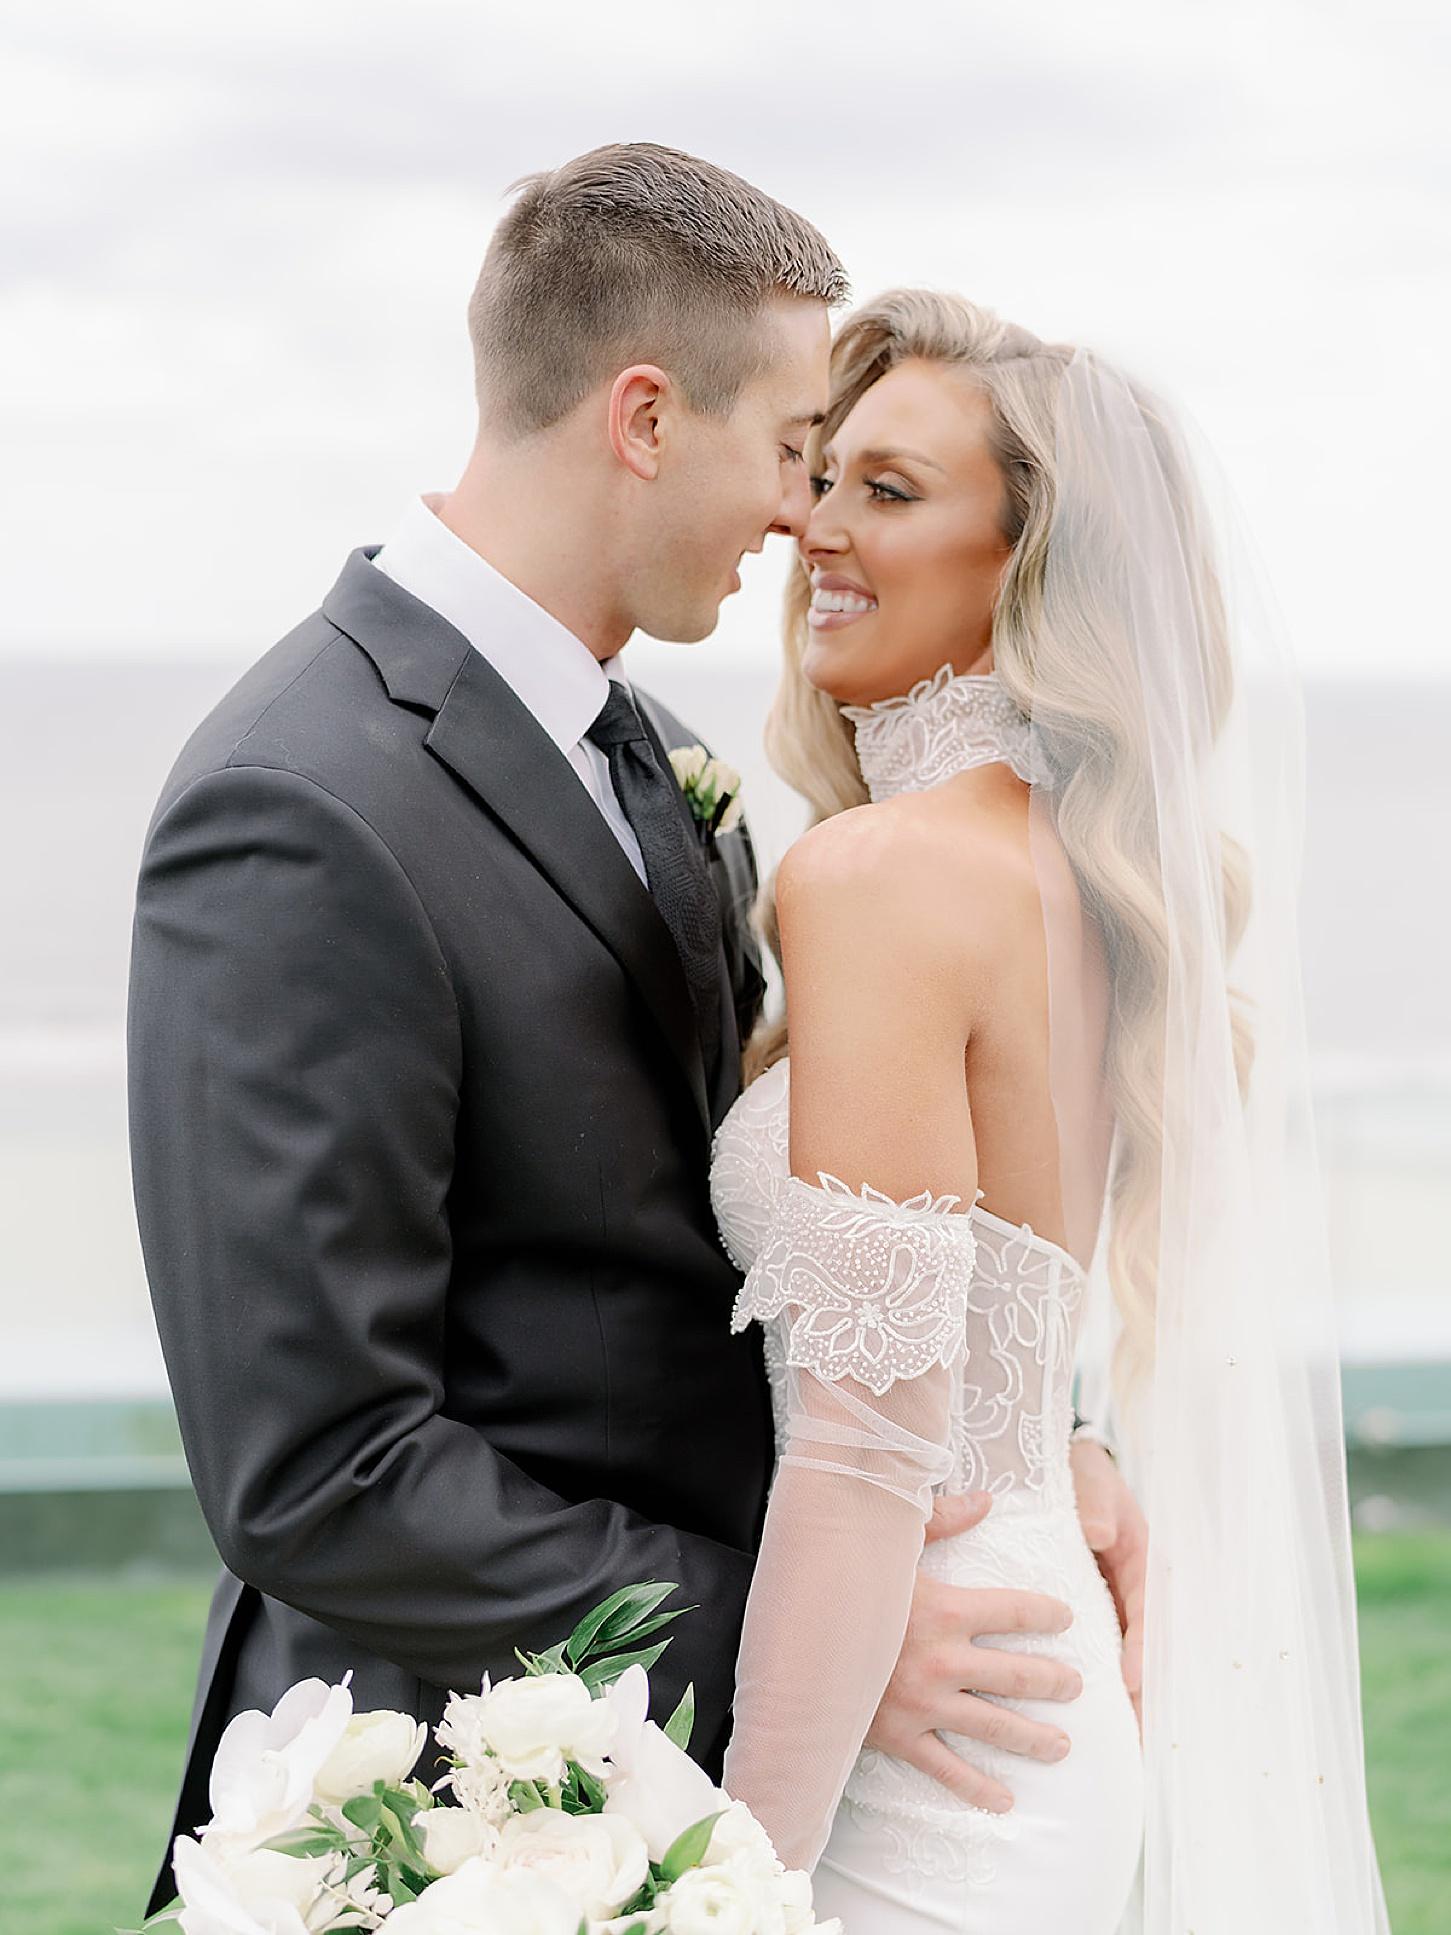 Atlantic City Wedding Photography Studio by Magdalena Studios Lexy Cha 0044